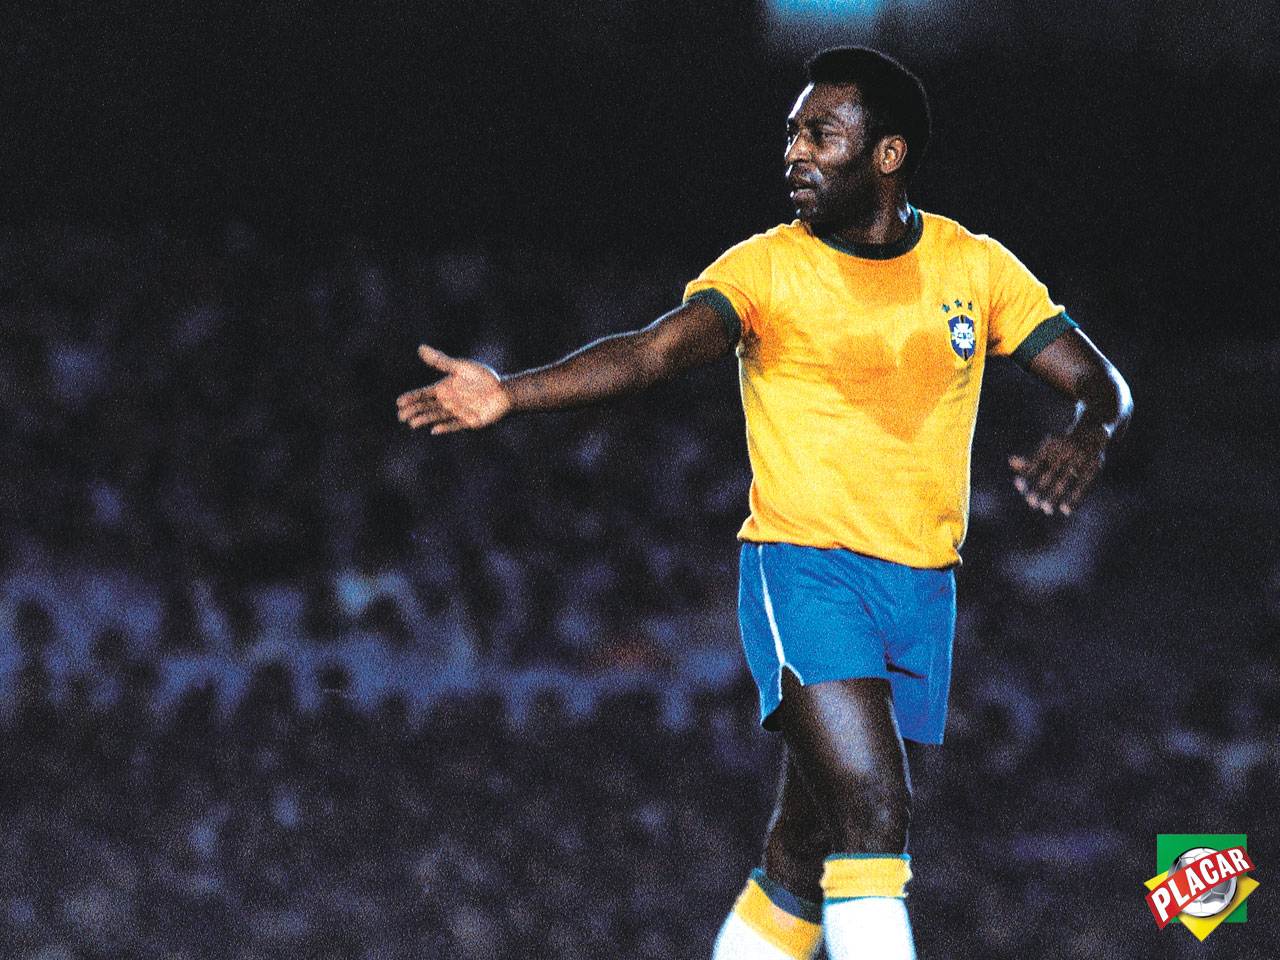 Pele Soccer Player